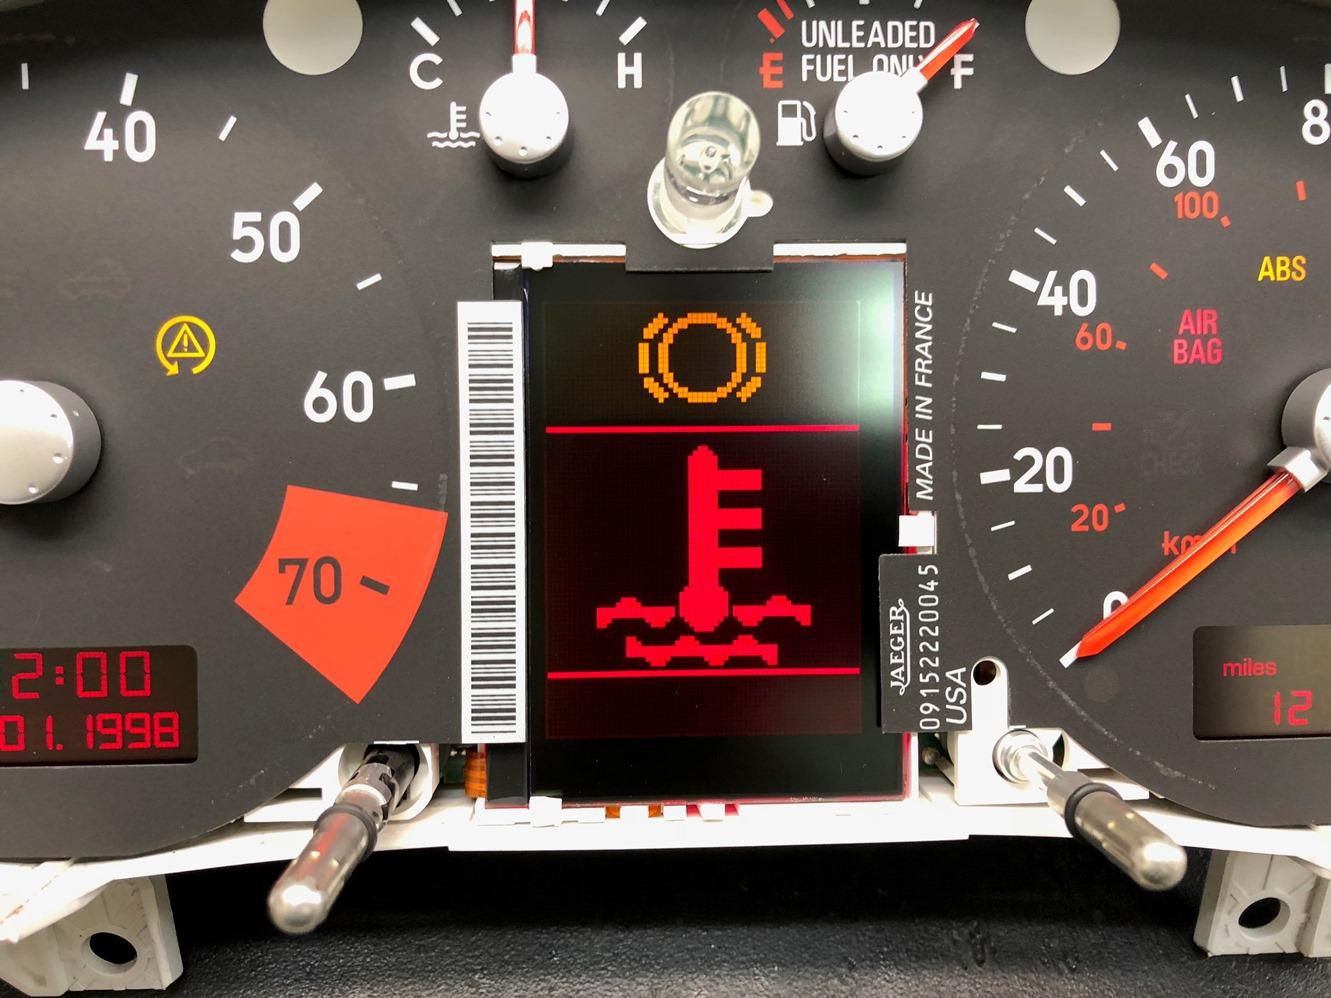 Audi TT Instrument Cluster Repair - Complete Rebuild/REMAN Service